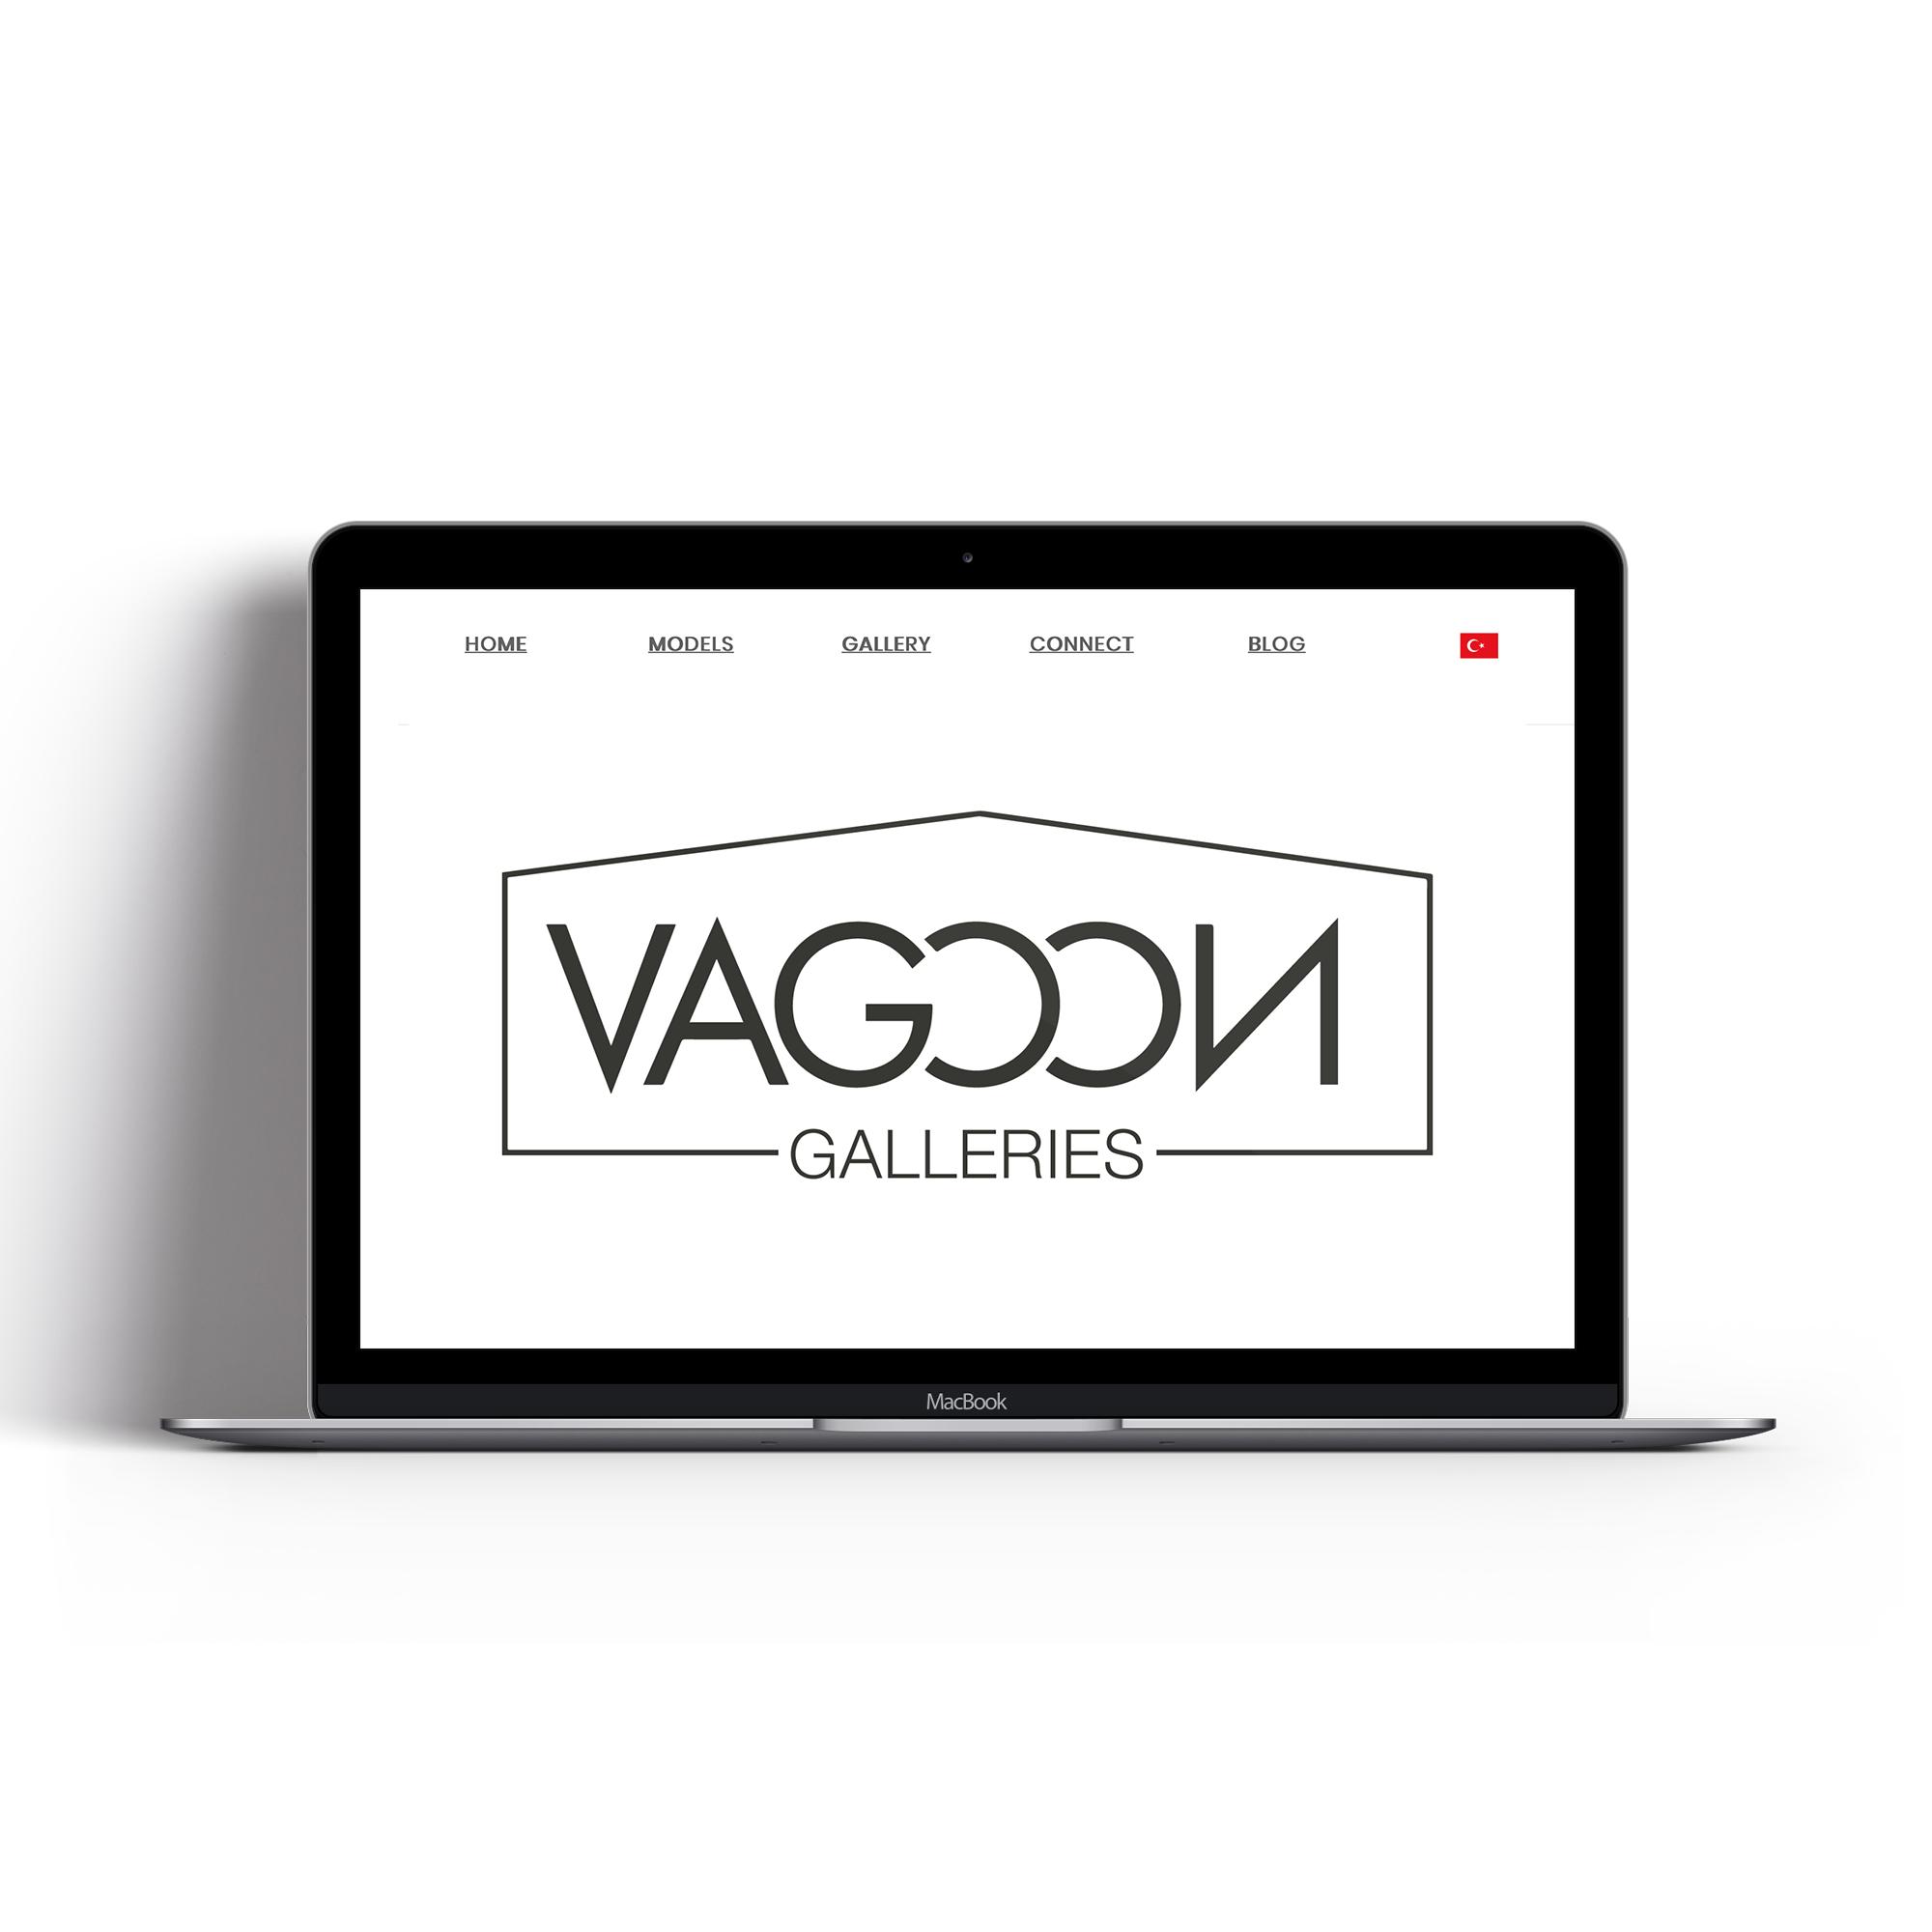 jason-b-graham-vagoon-house-galleries-featured-image